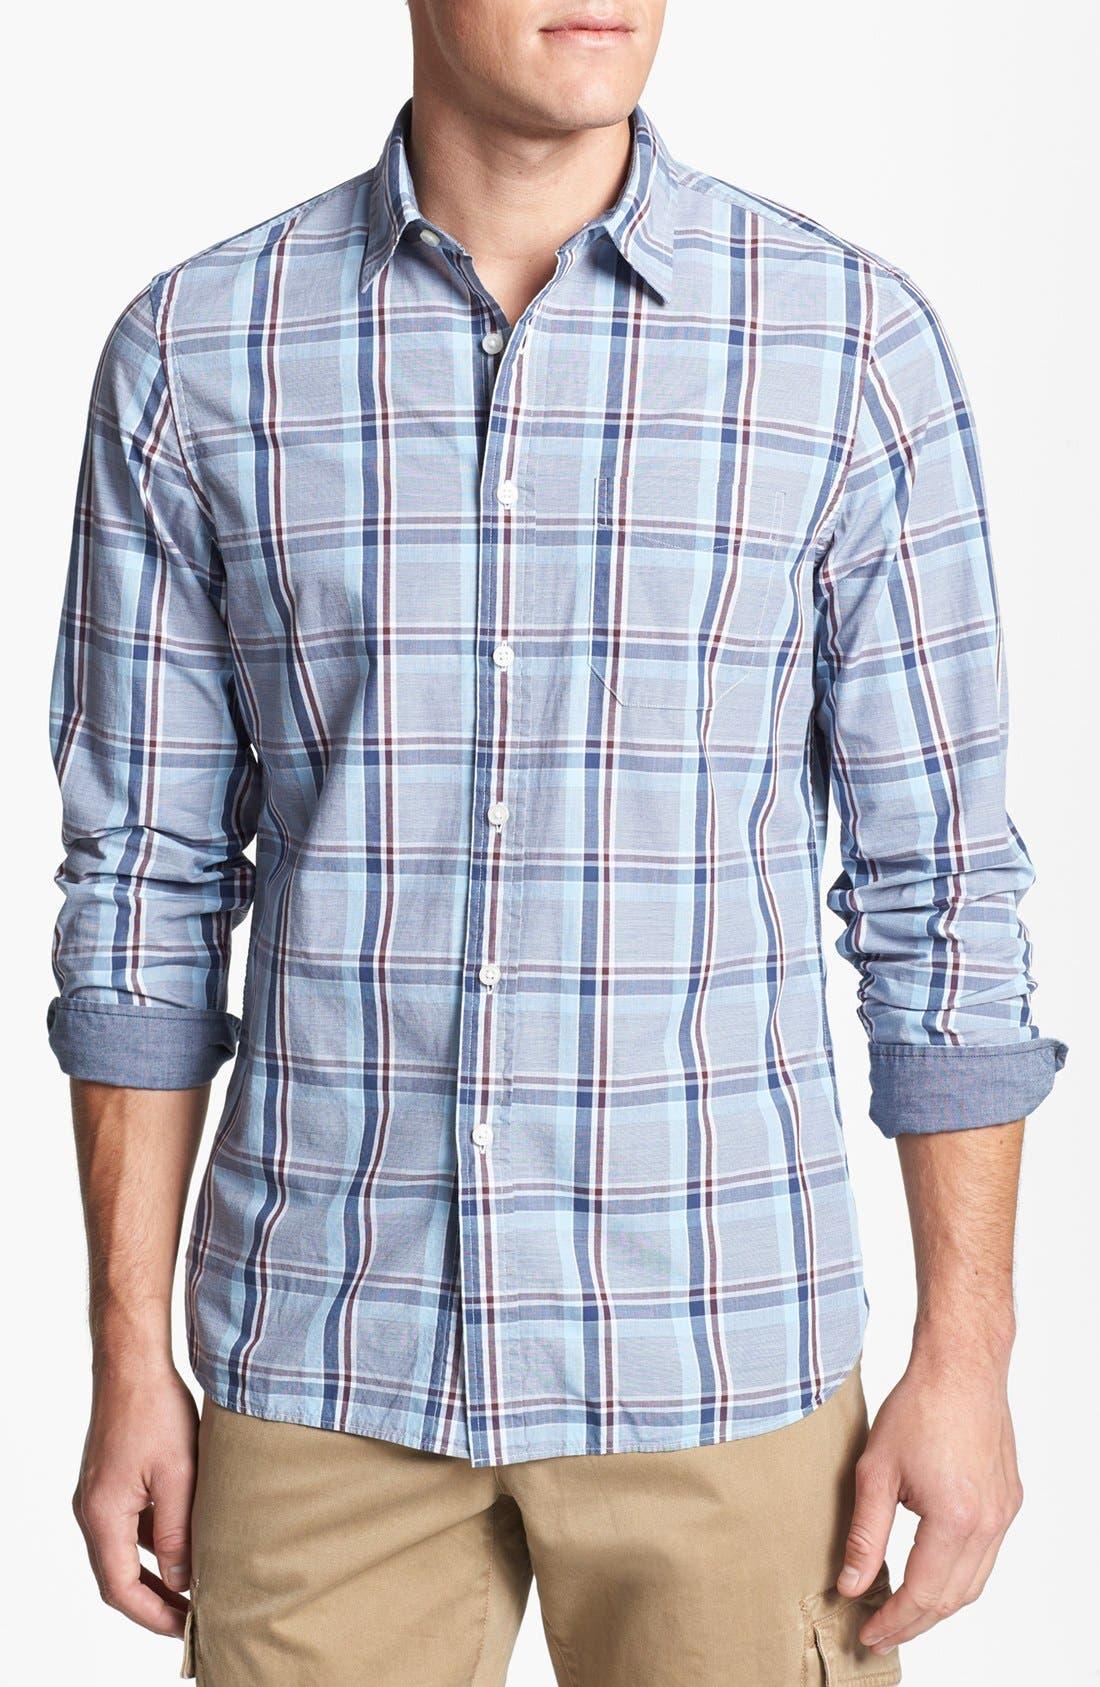 Alternate Image 1 Selected - Wallin & Bros. Trim Fit Poplin Sport Shirt